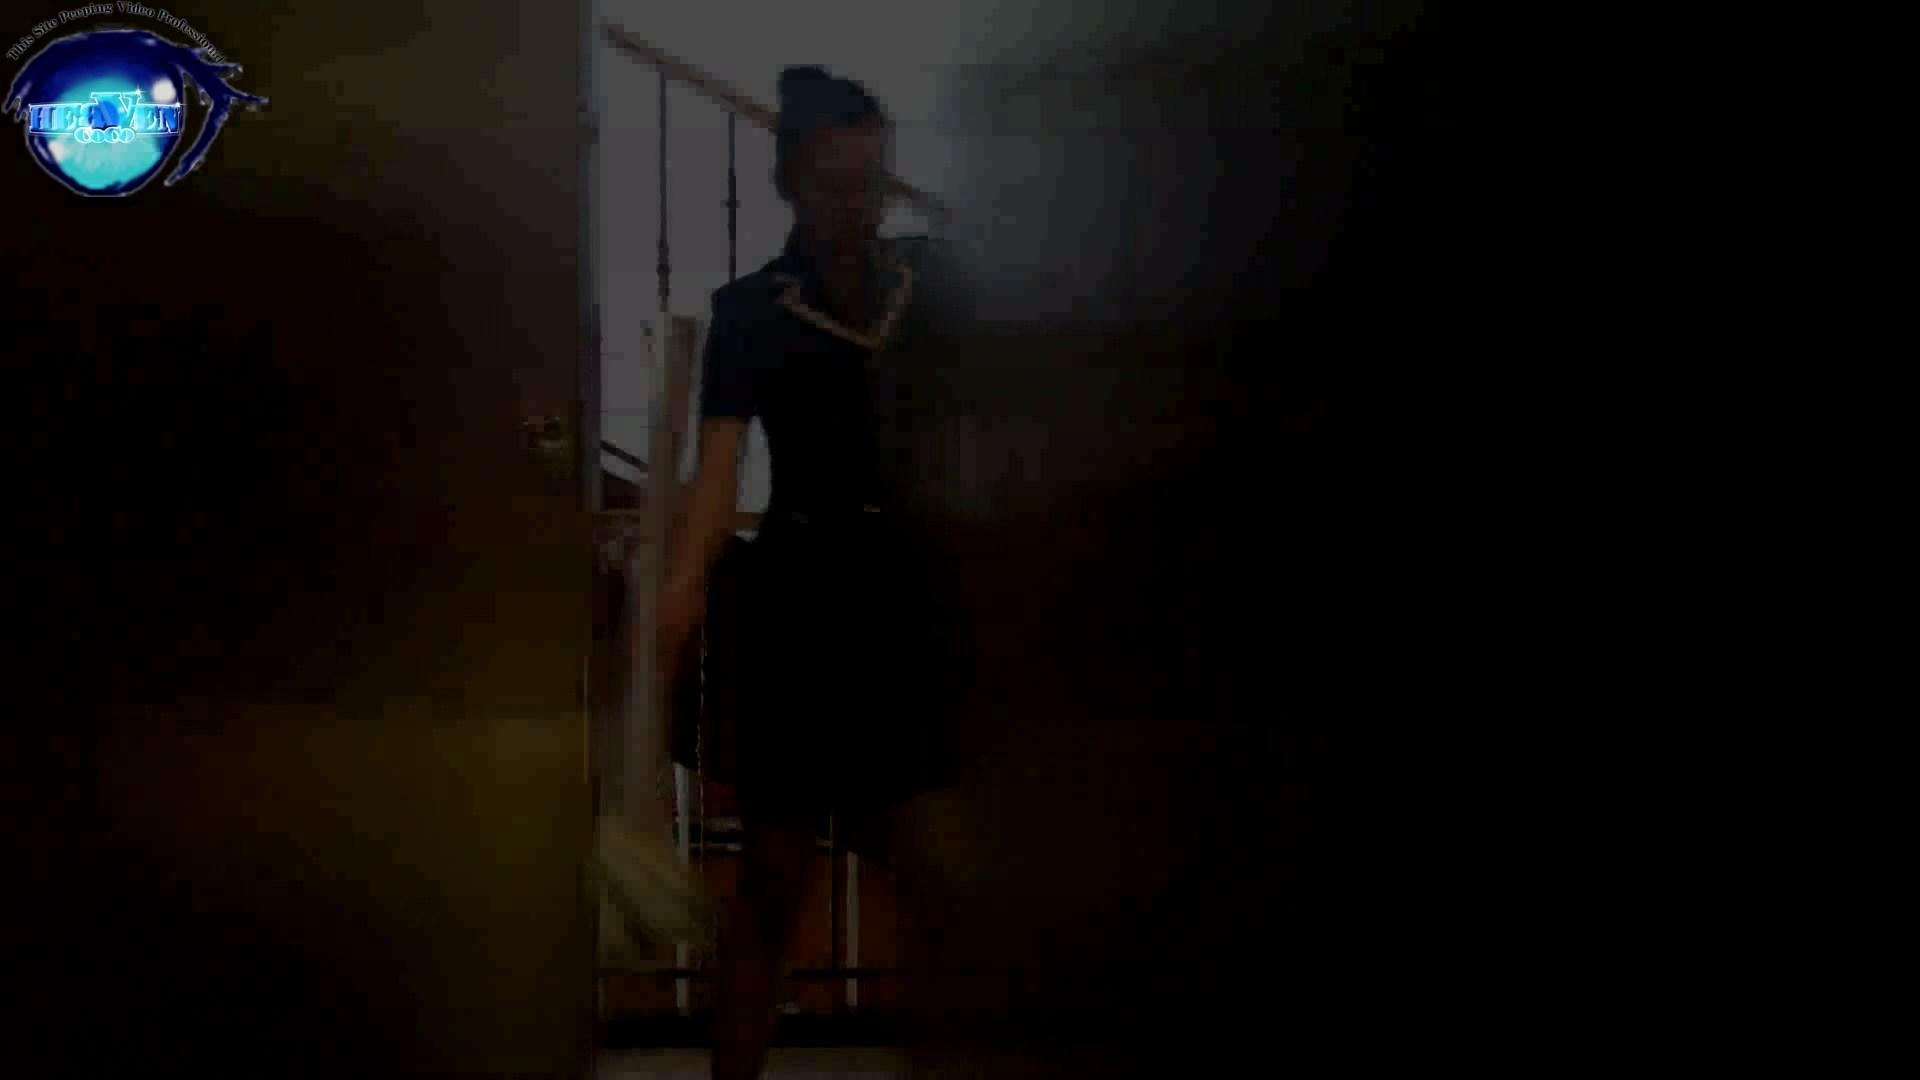 GOD HAND ファッションショッピングセンター盗撮vol.02前編 盗撮 ワレメ無修正動画無料 74連発 59